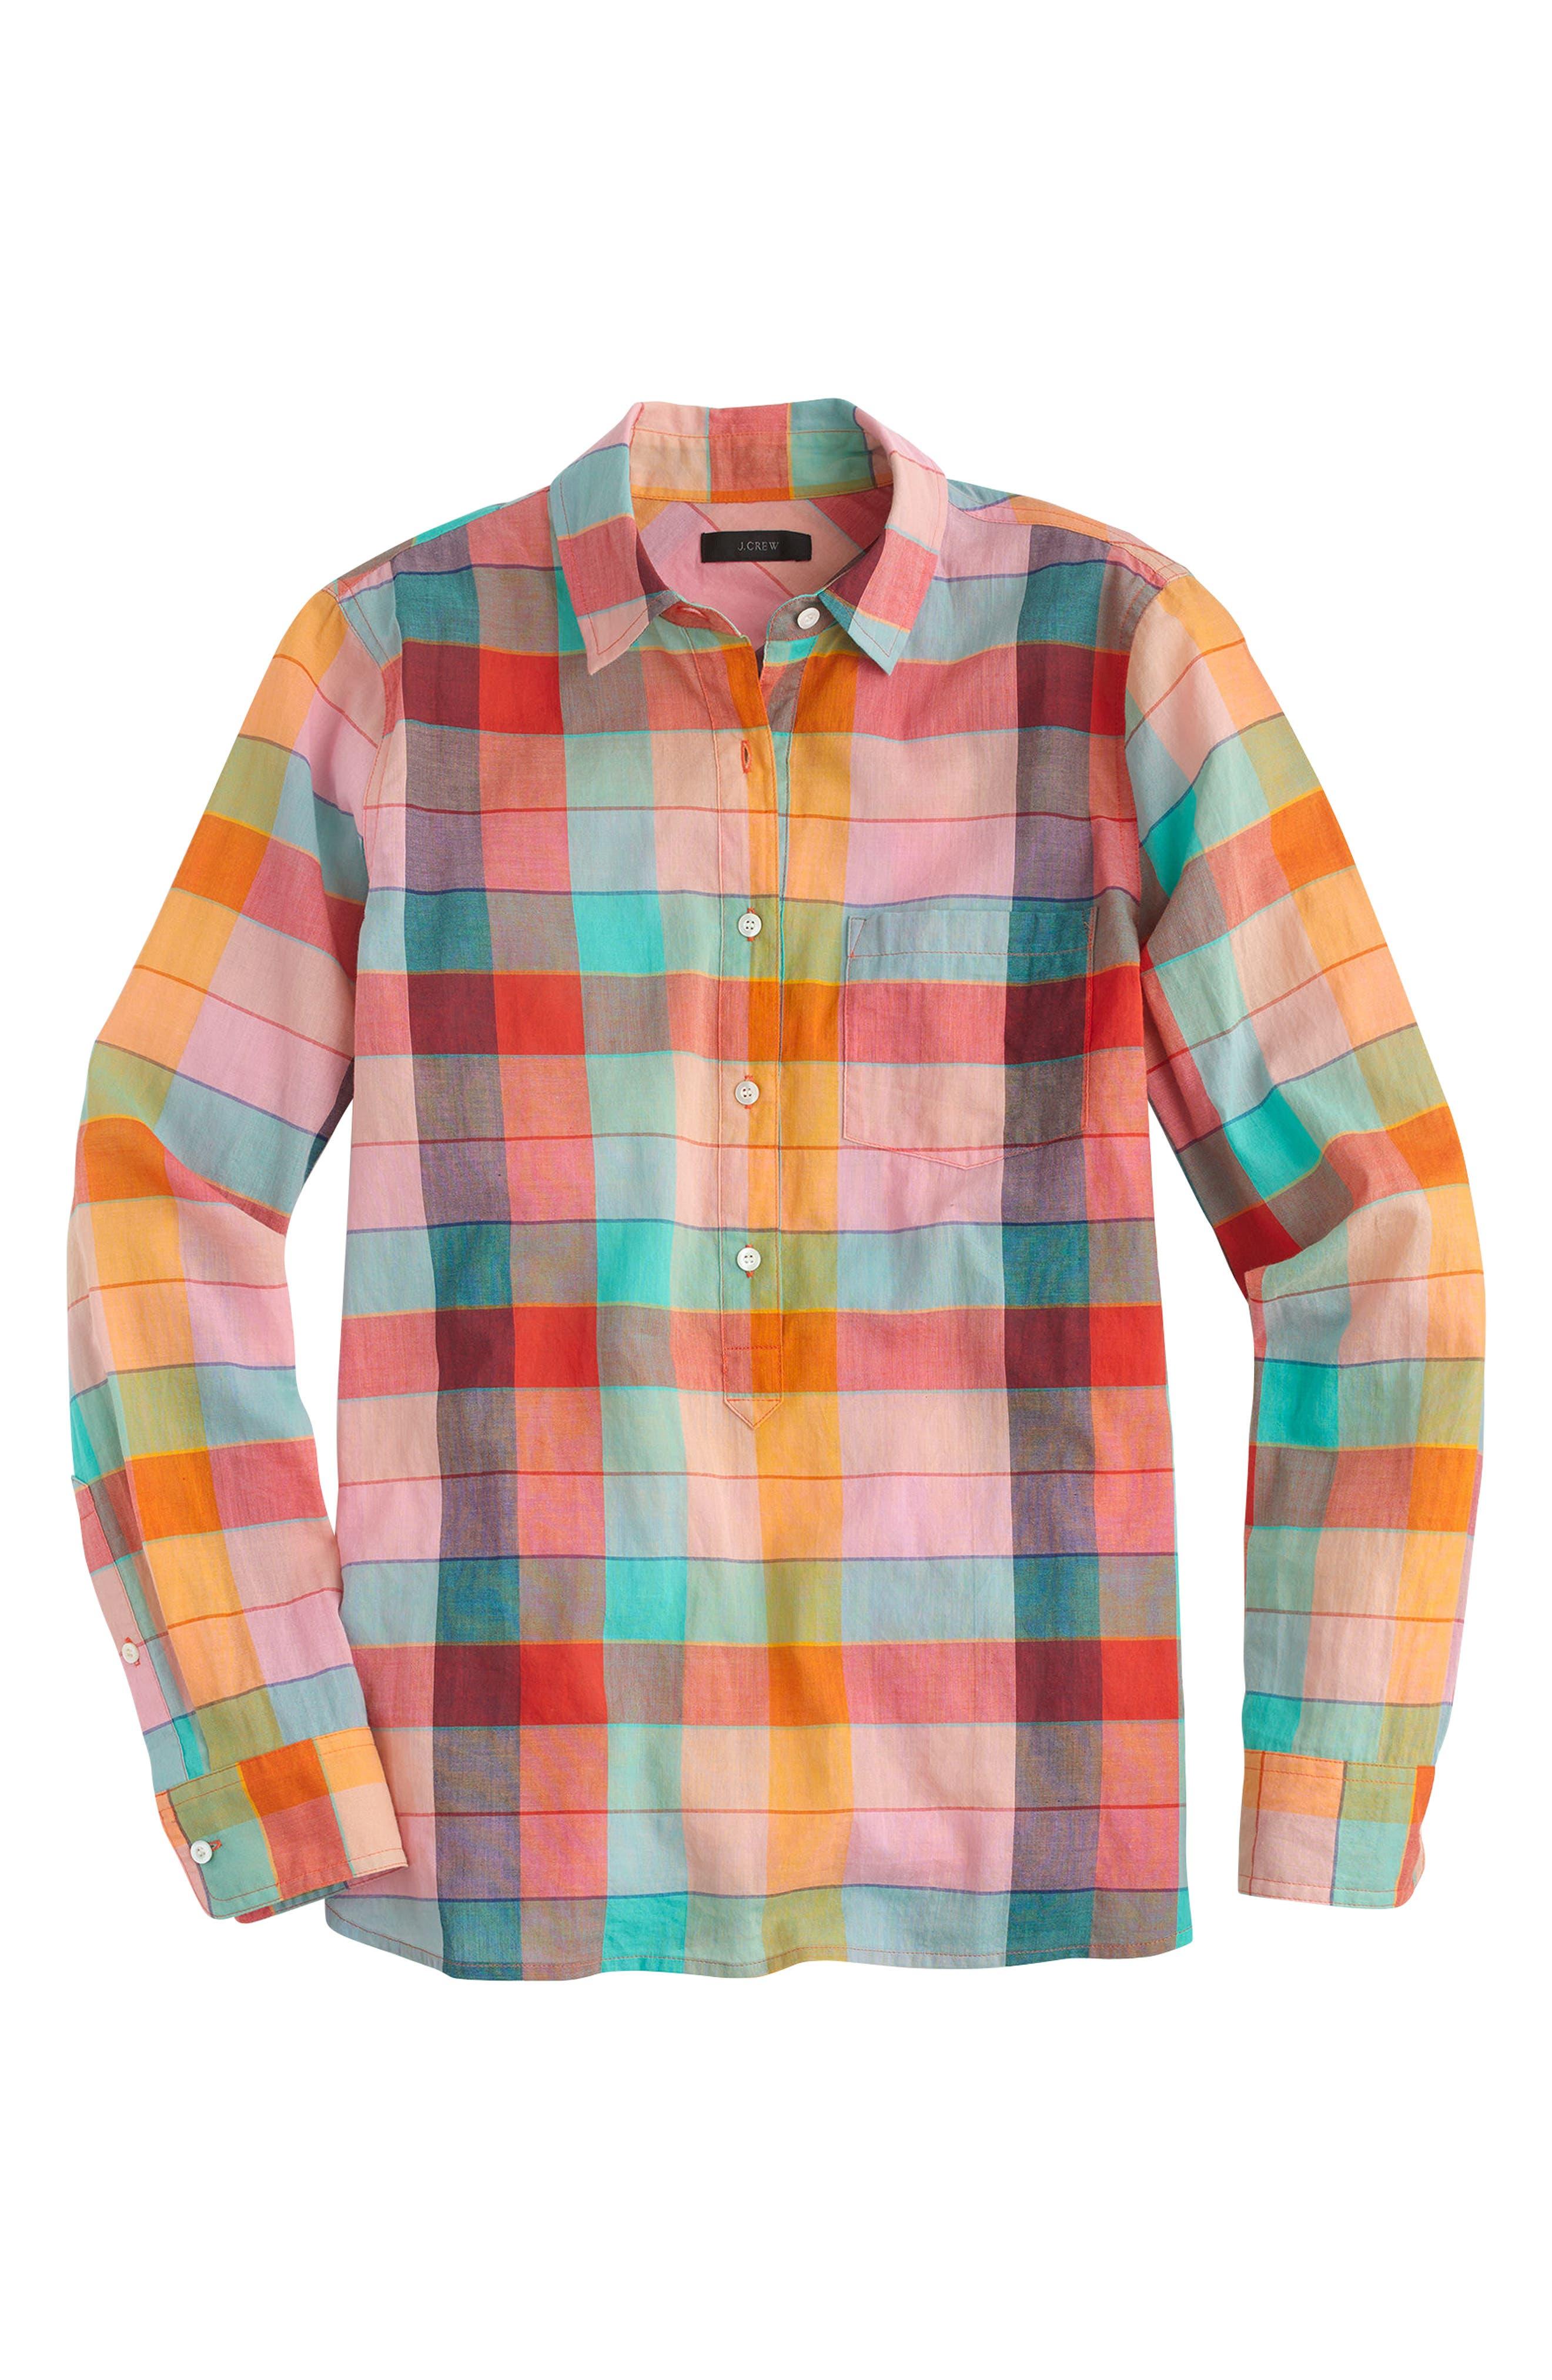 Alternate Image 3  - J.Crew Rainbow Vintage Plaid Lightweight Popover Shirt (Regular & Petite)